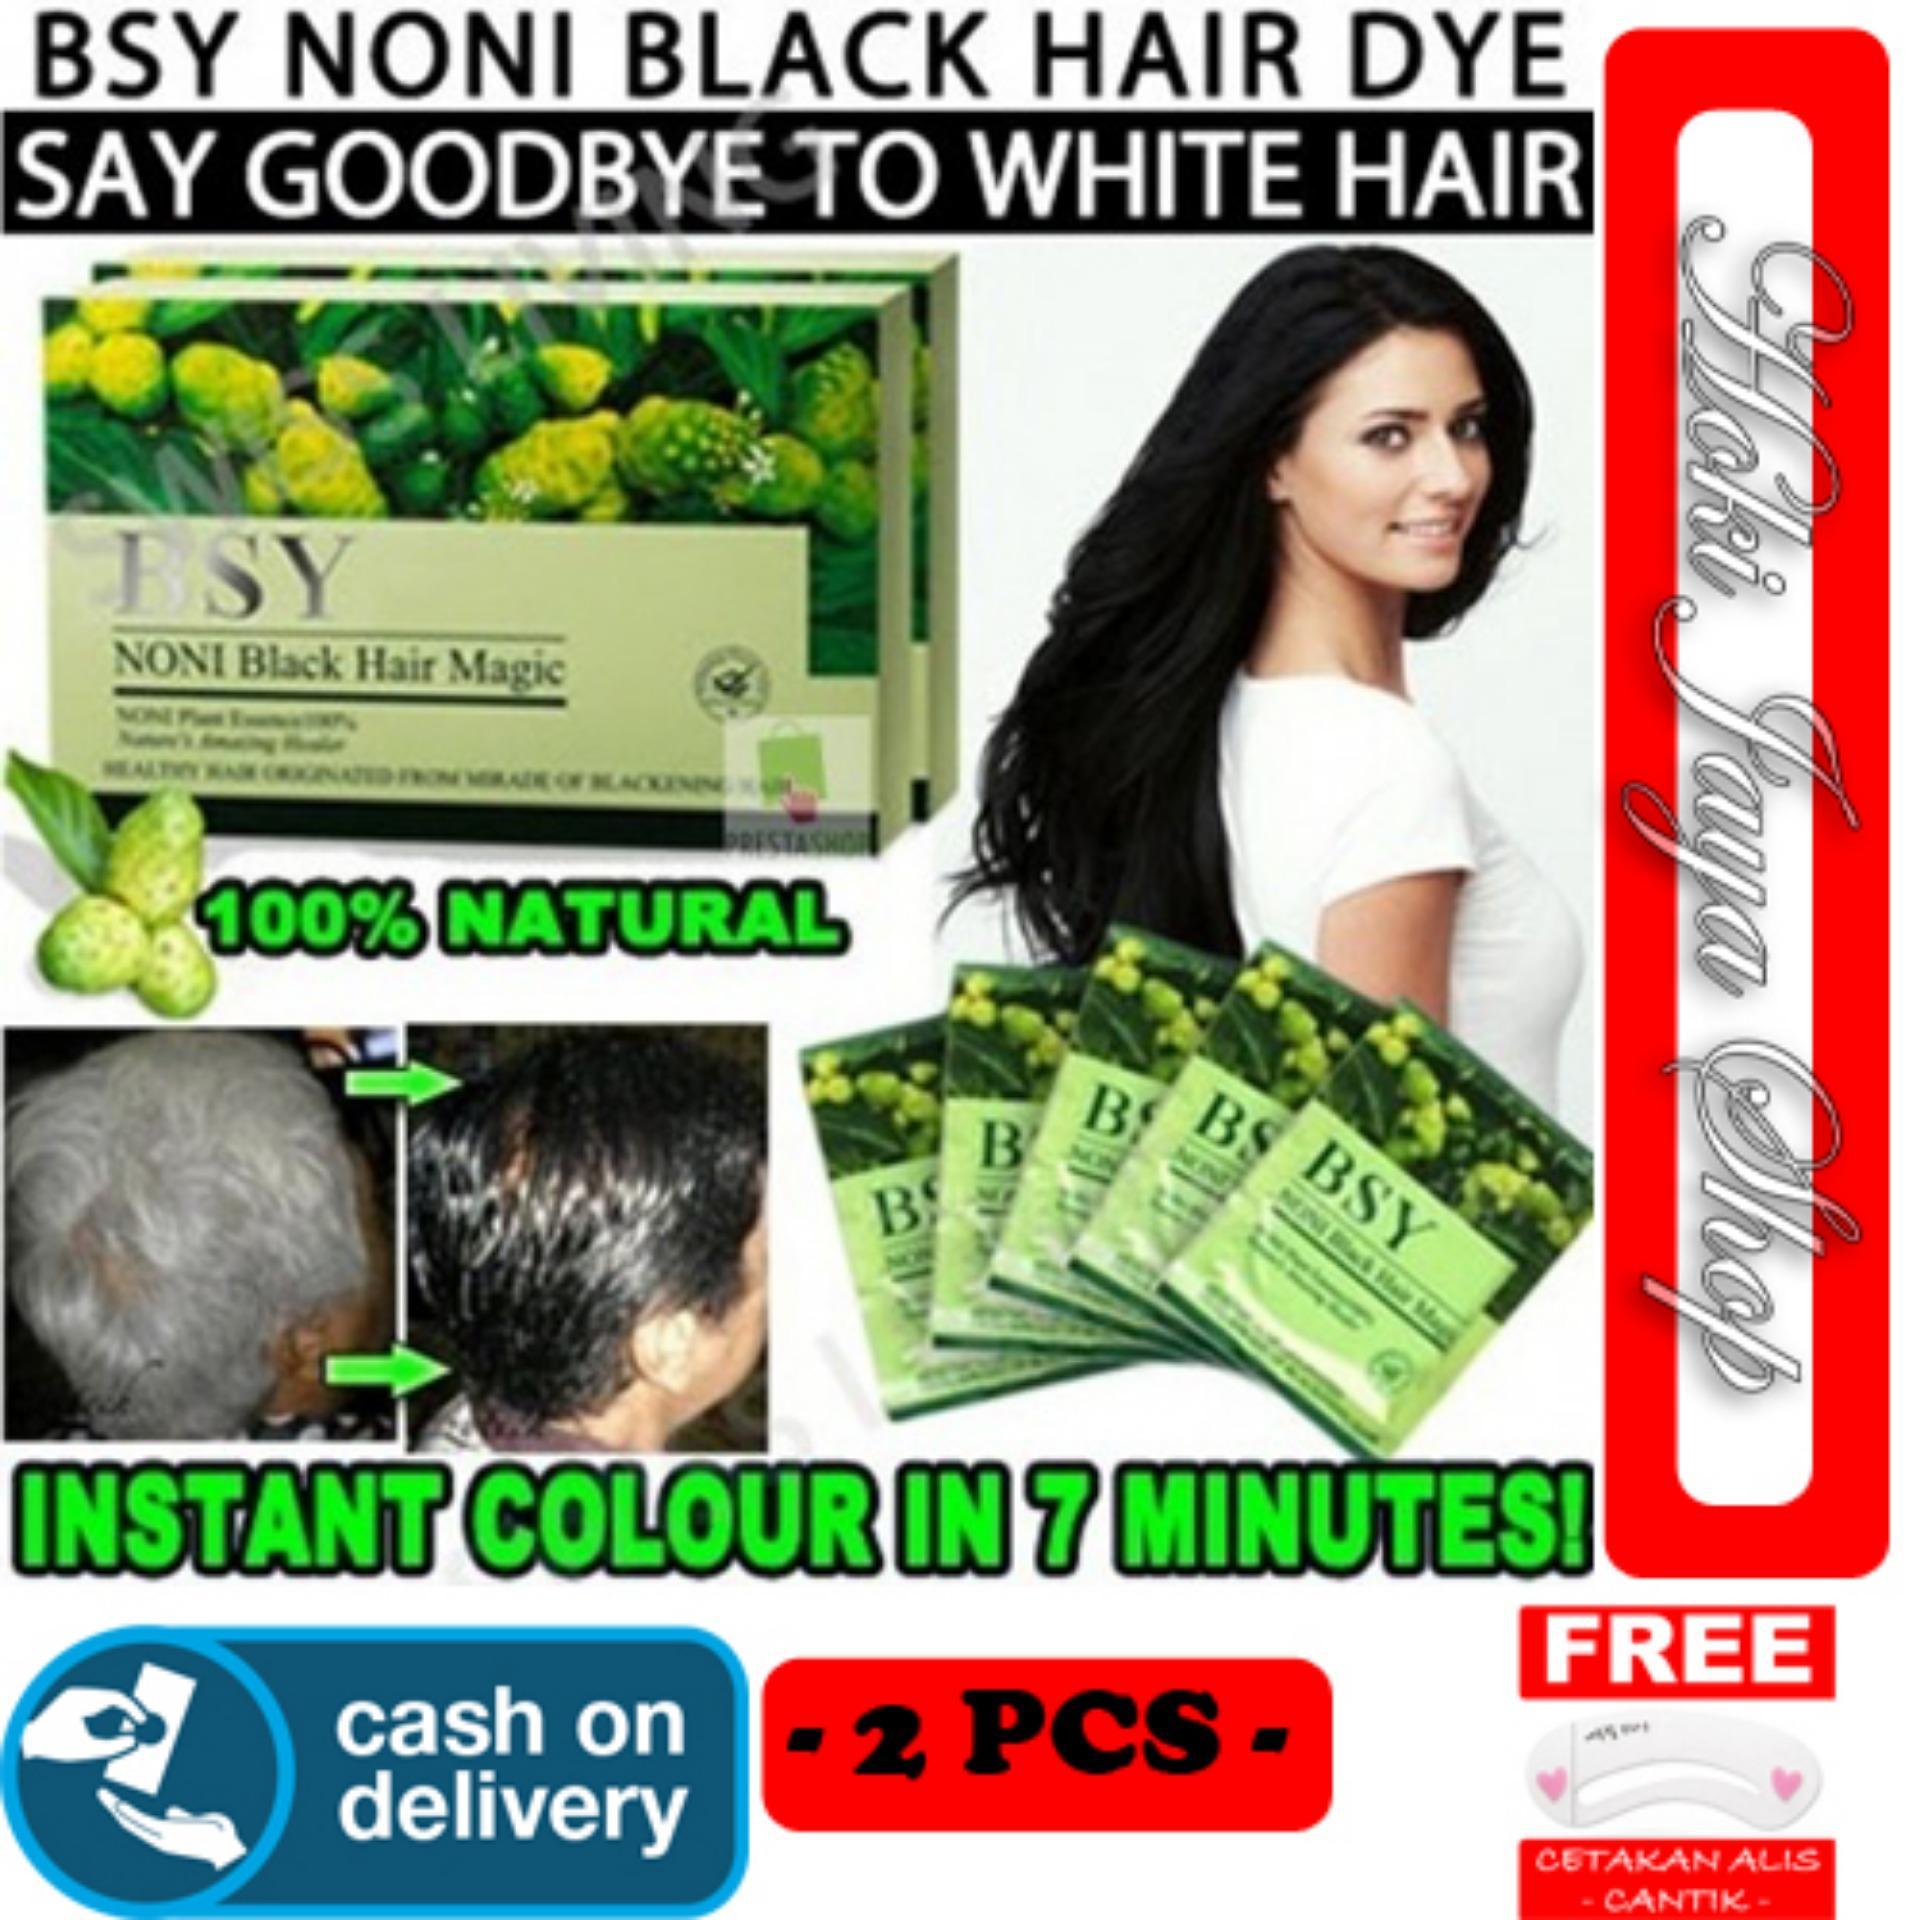 HOKI COD - BSY Noni Black Hair Magic Shampo - Cat Rambut Hitam - Penghitam Rambut - 2 PCS + Gratis Cetak Alis Cantik - Premium